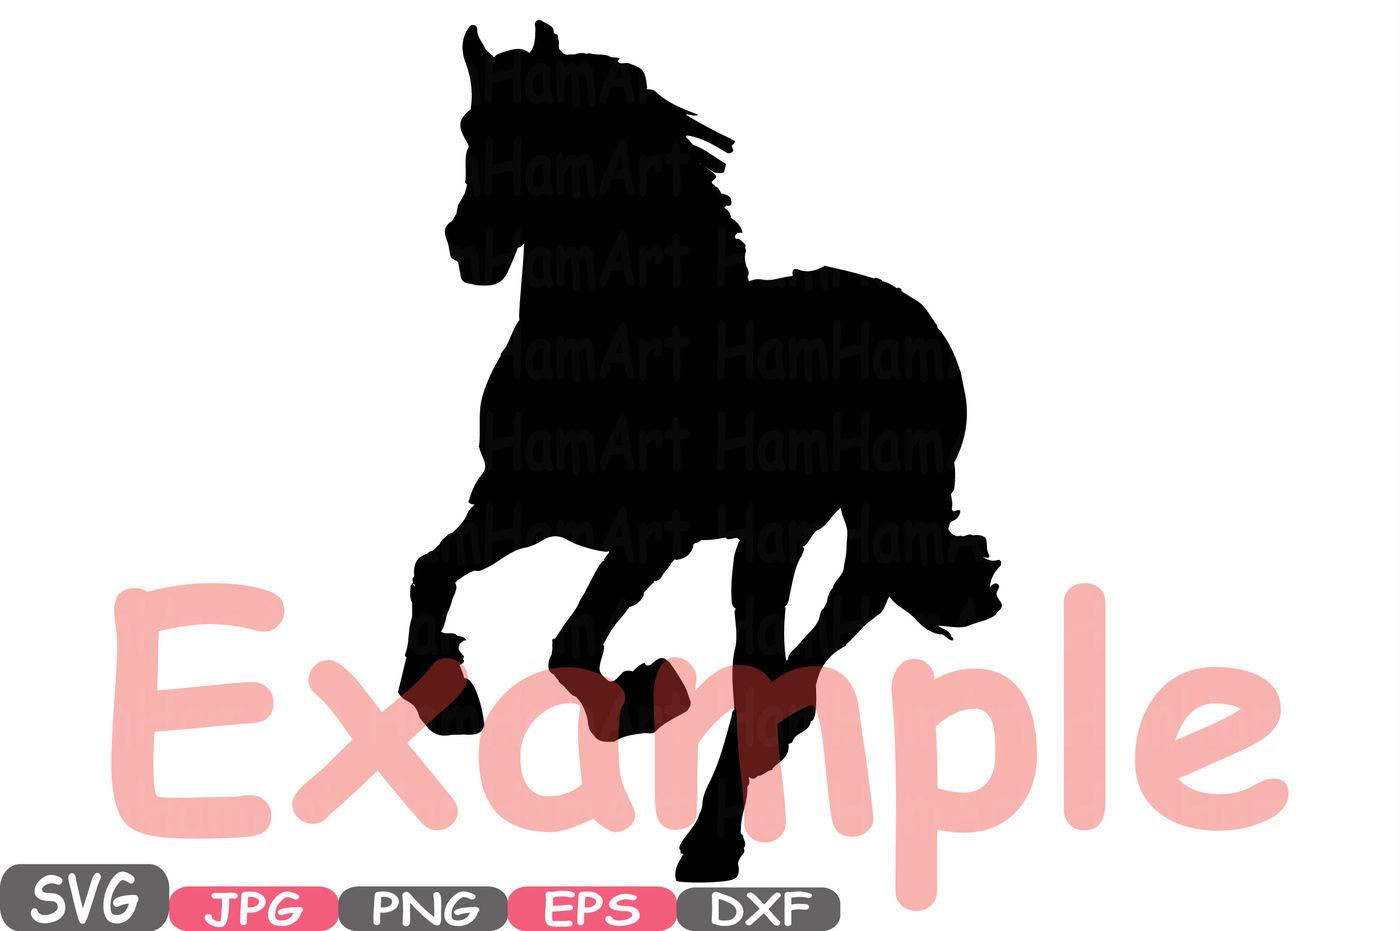 Free Download Images For New Design Svg Cf Free Svg Horse